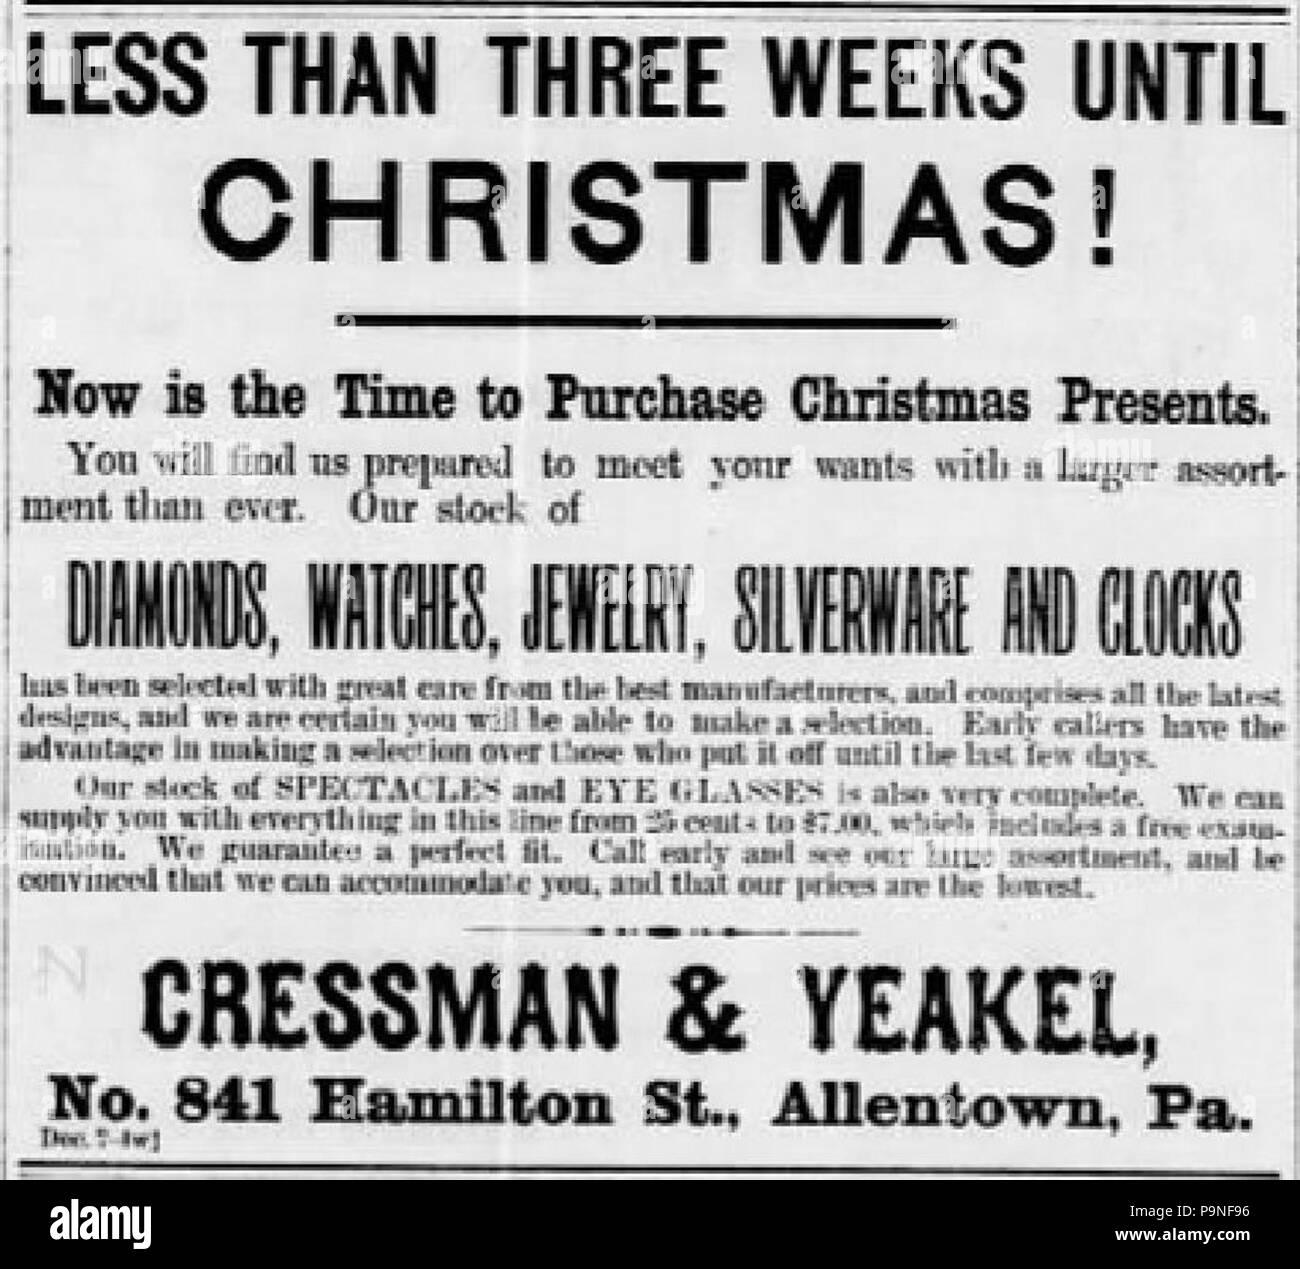 22 1892 - Cressman & Yeakel - 14 Dec MC - Allentown PA Stock Photo